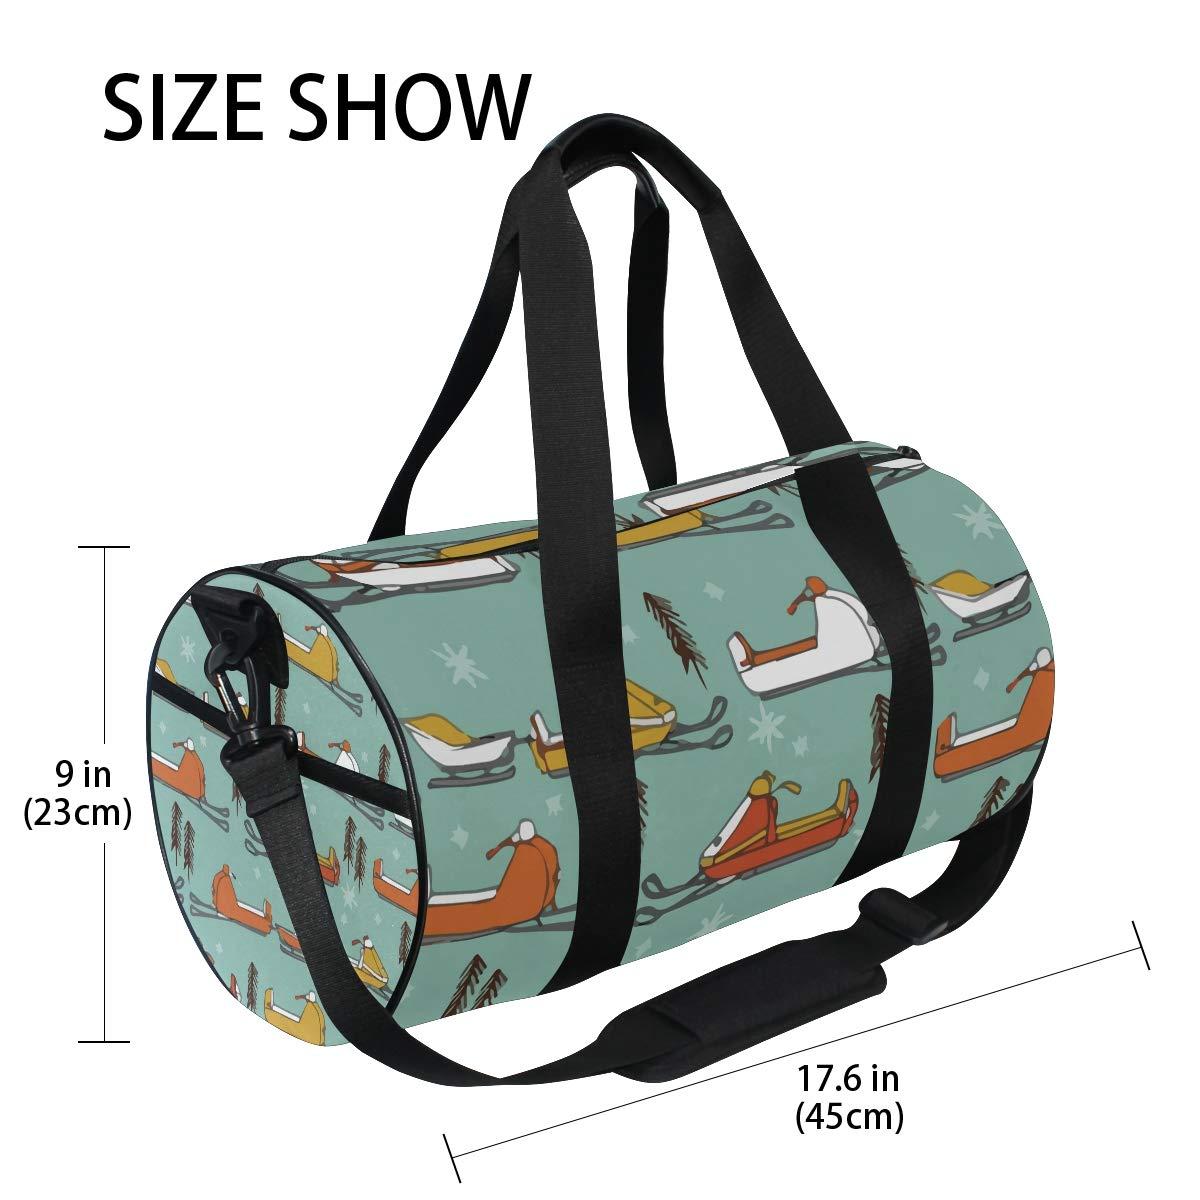 Sports Gym Duffel Barrel Bag Snowmobiles Vintage Mustard Orange Travel Luggage Handbag for Men Women